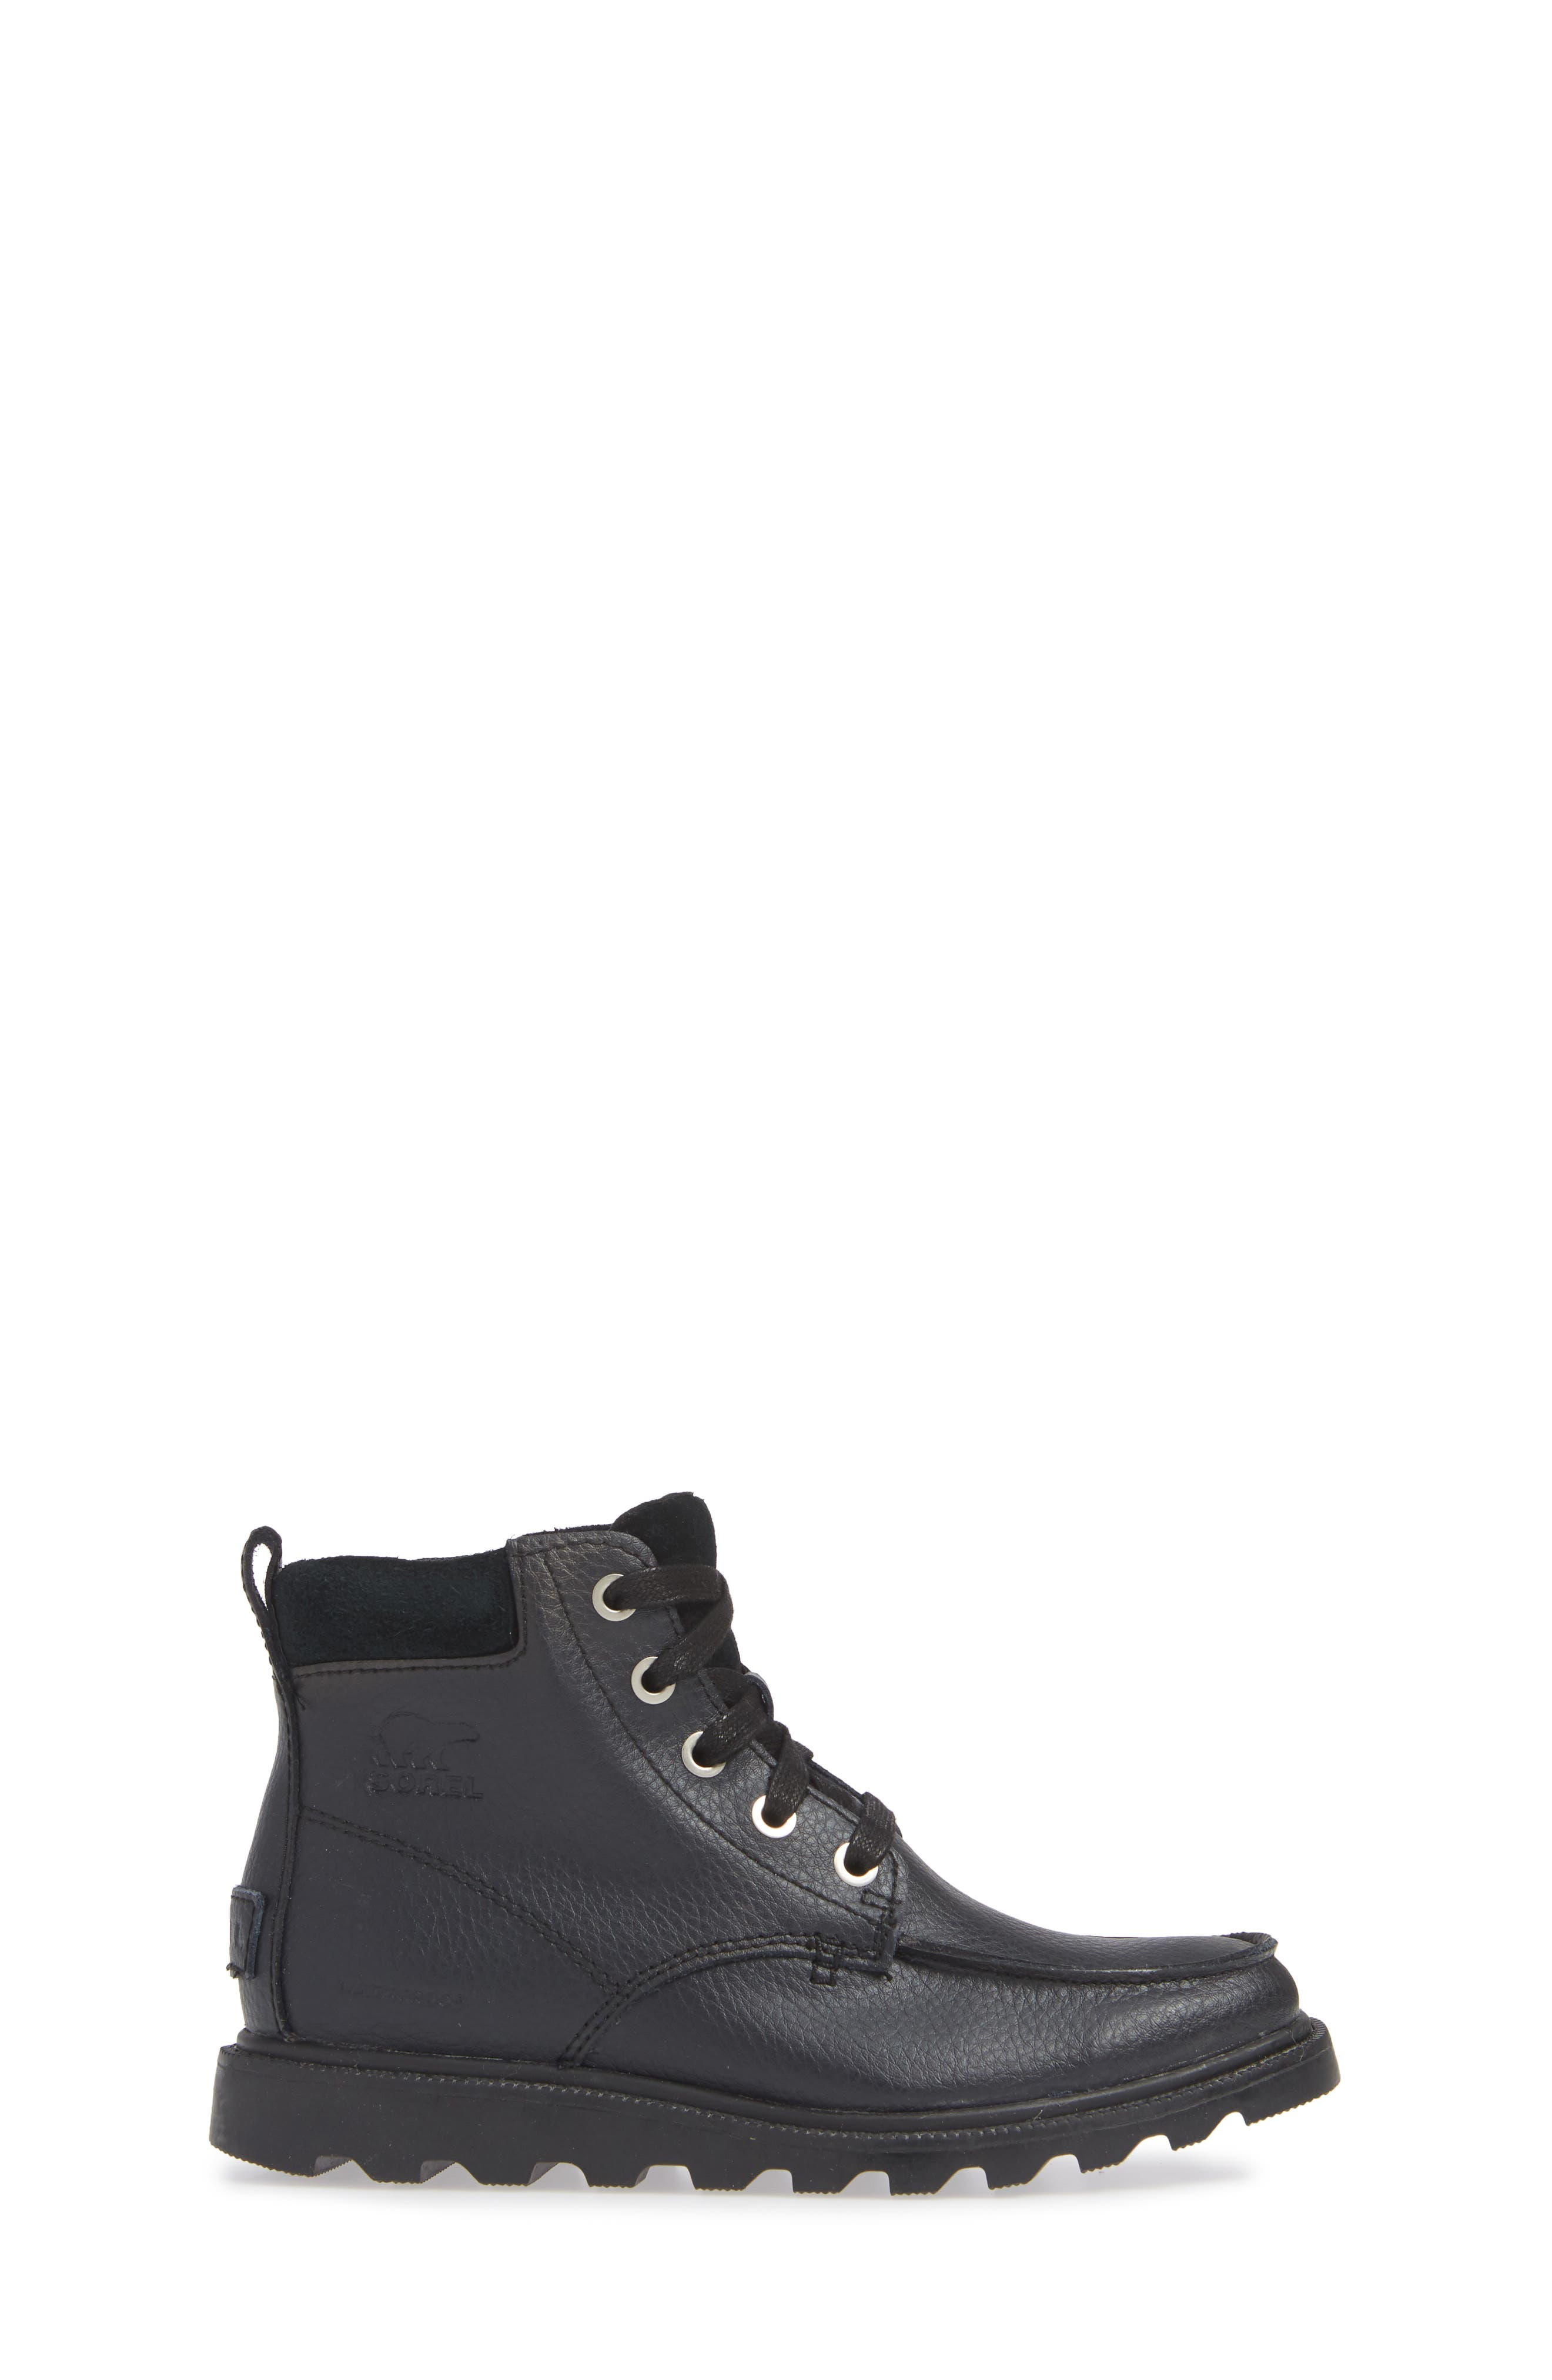 Madson Waterproof Moc Toe Boot,                             Alternate thumbnail 3, color,                             BLACK